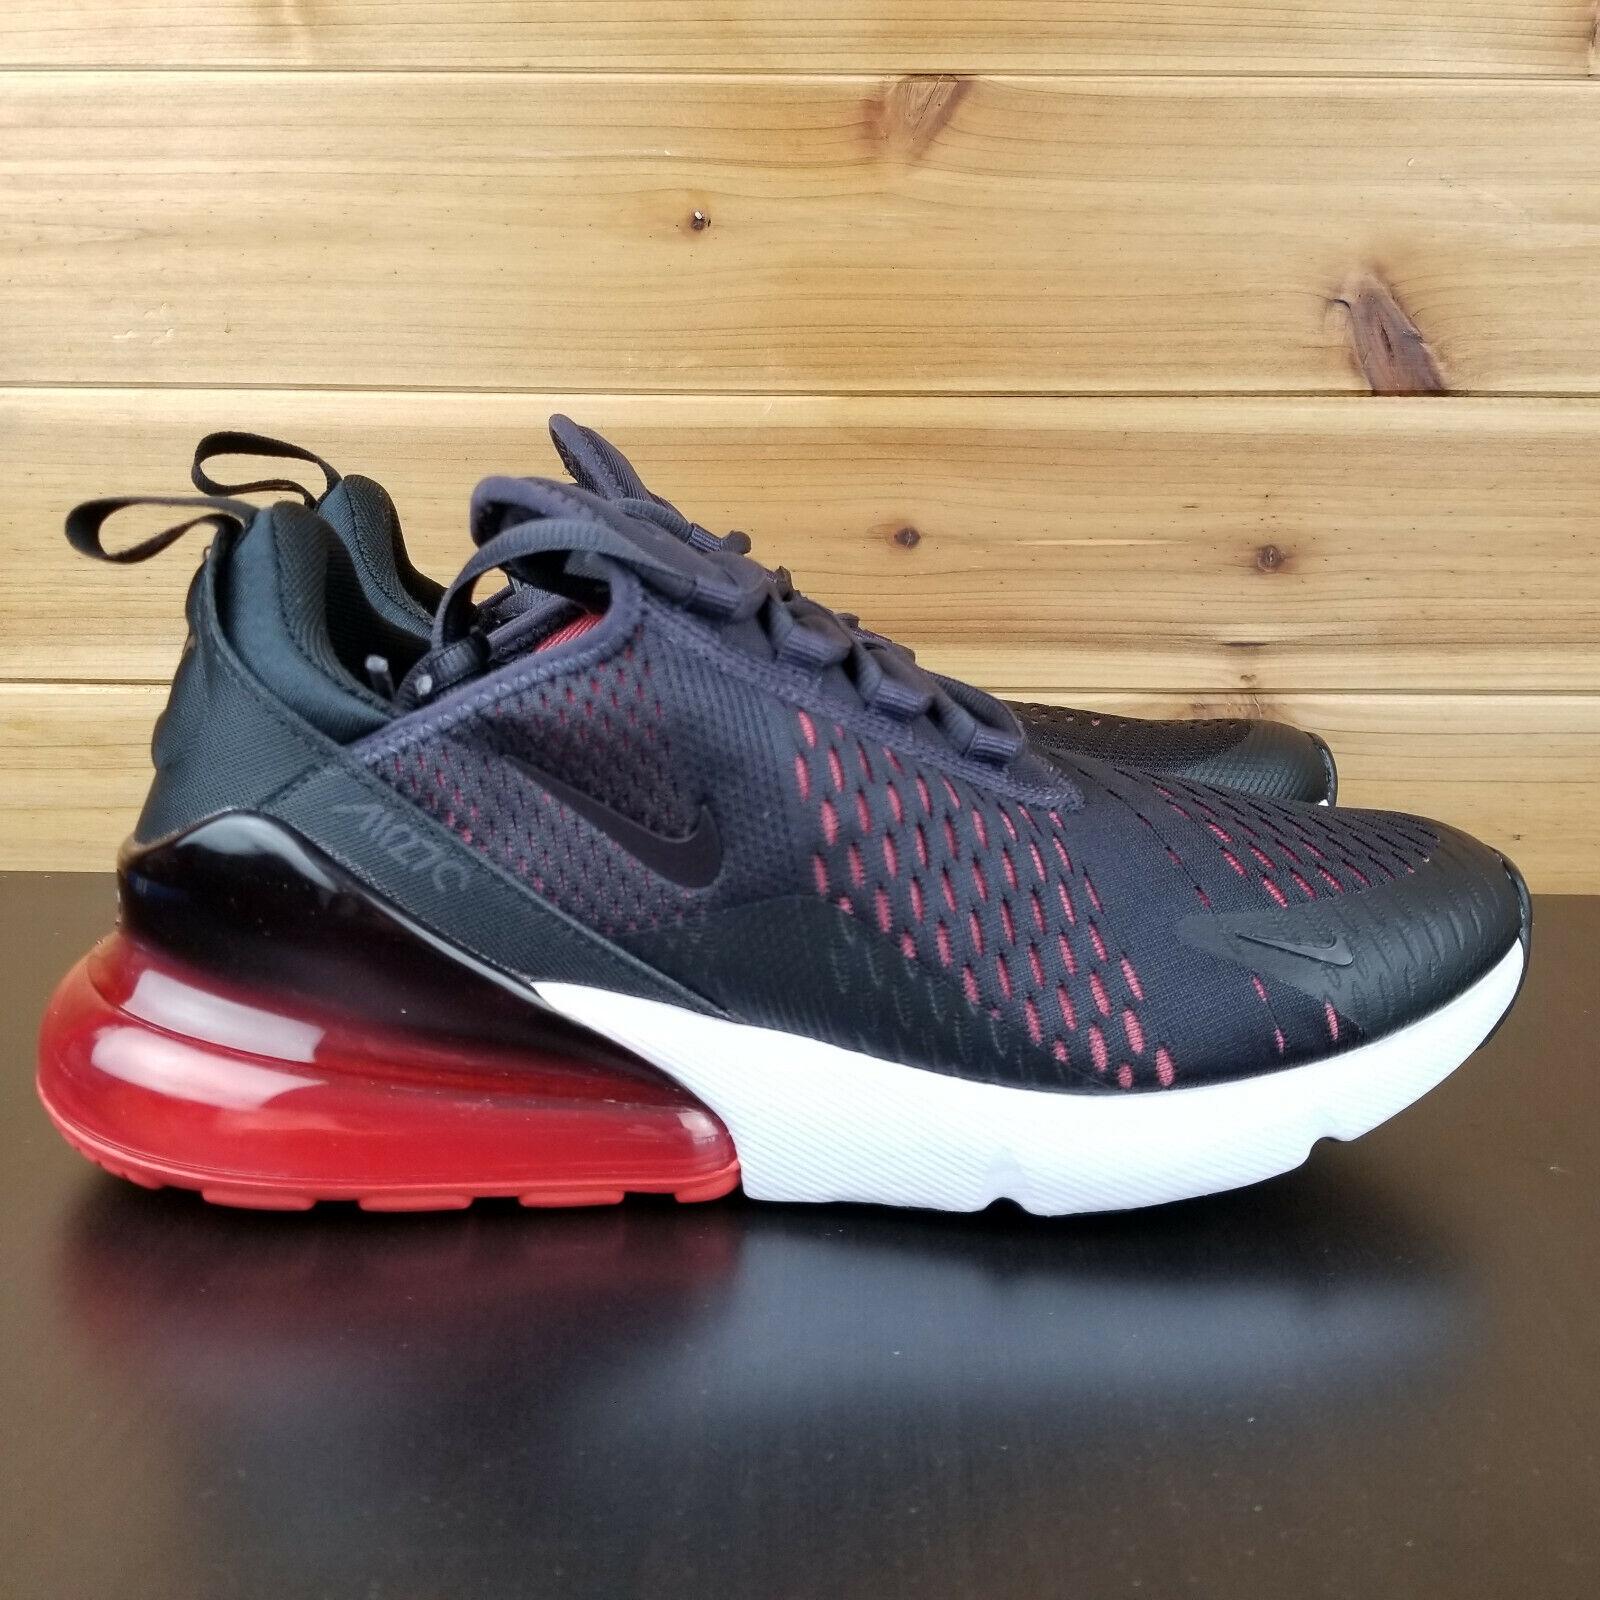 Nike Air Max 270 Running Men's shoes Oil Grey Black Habablack Red AH8050-013